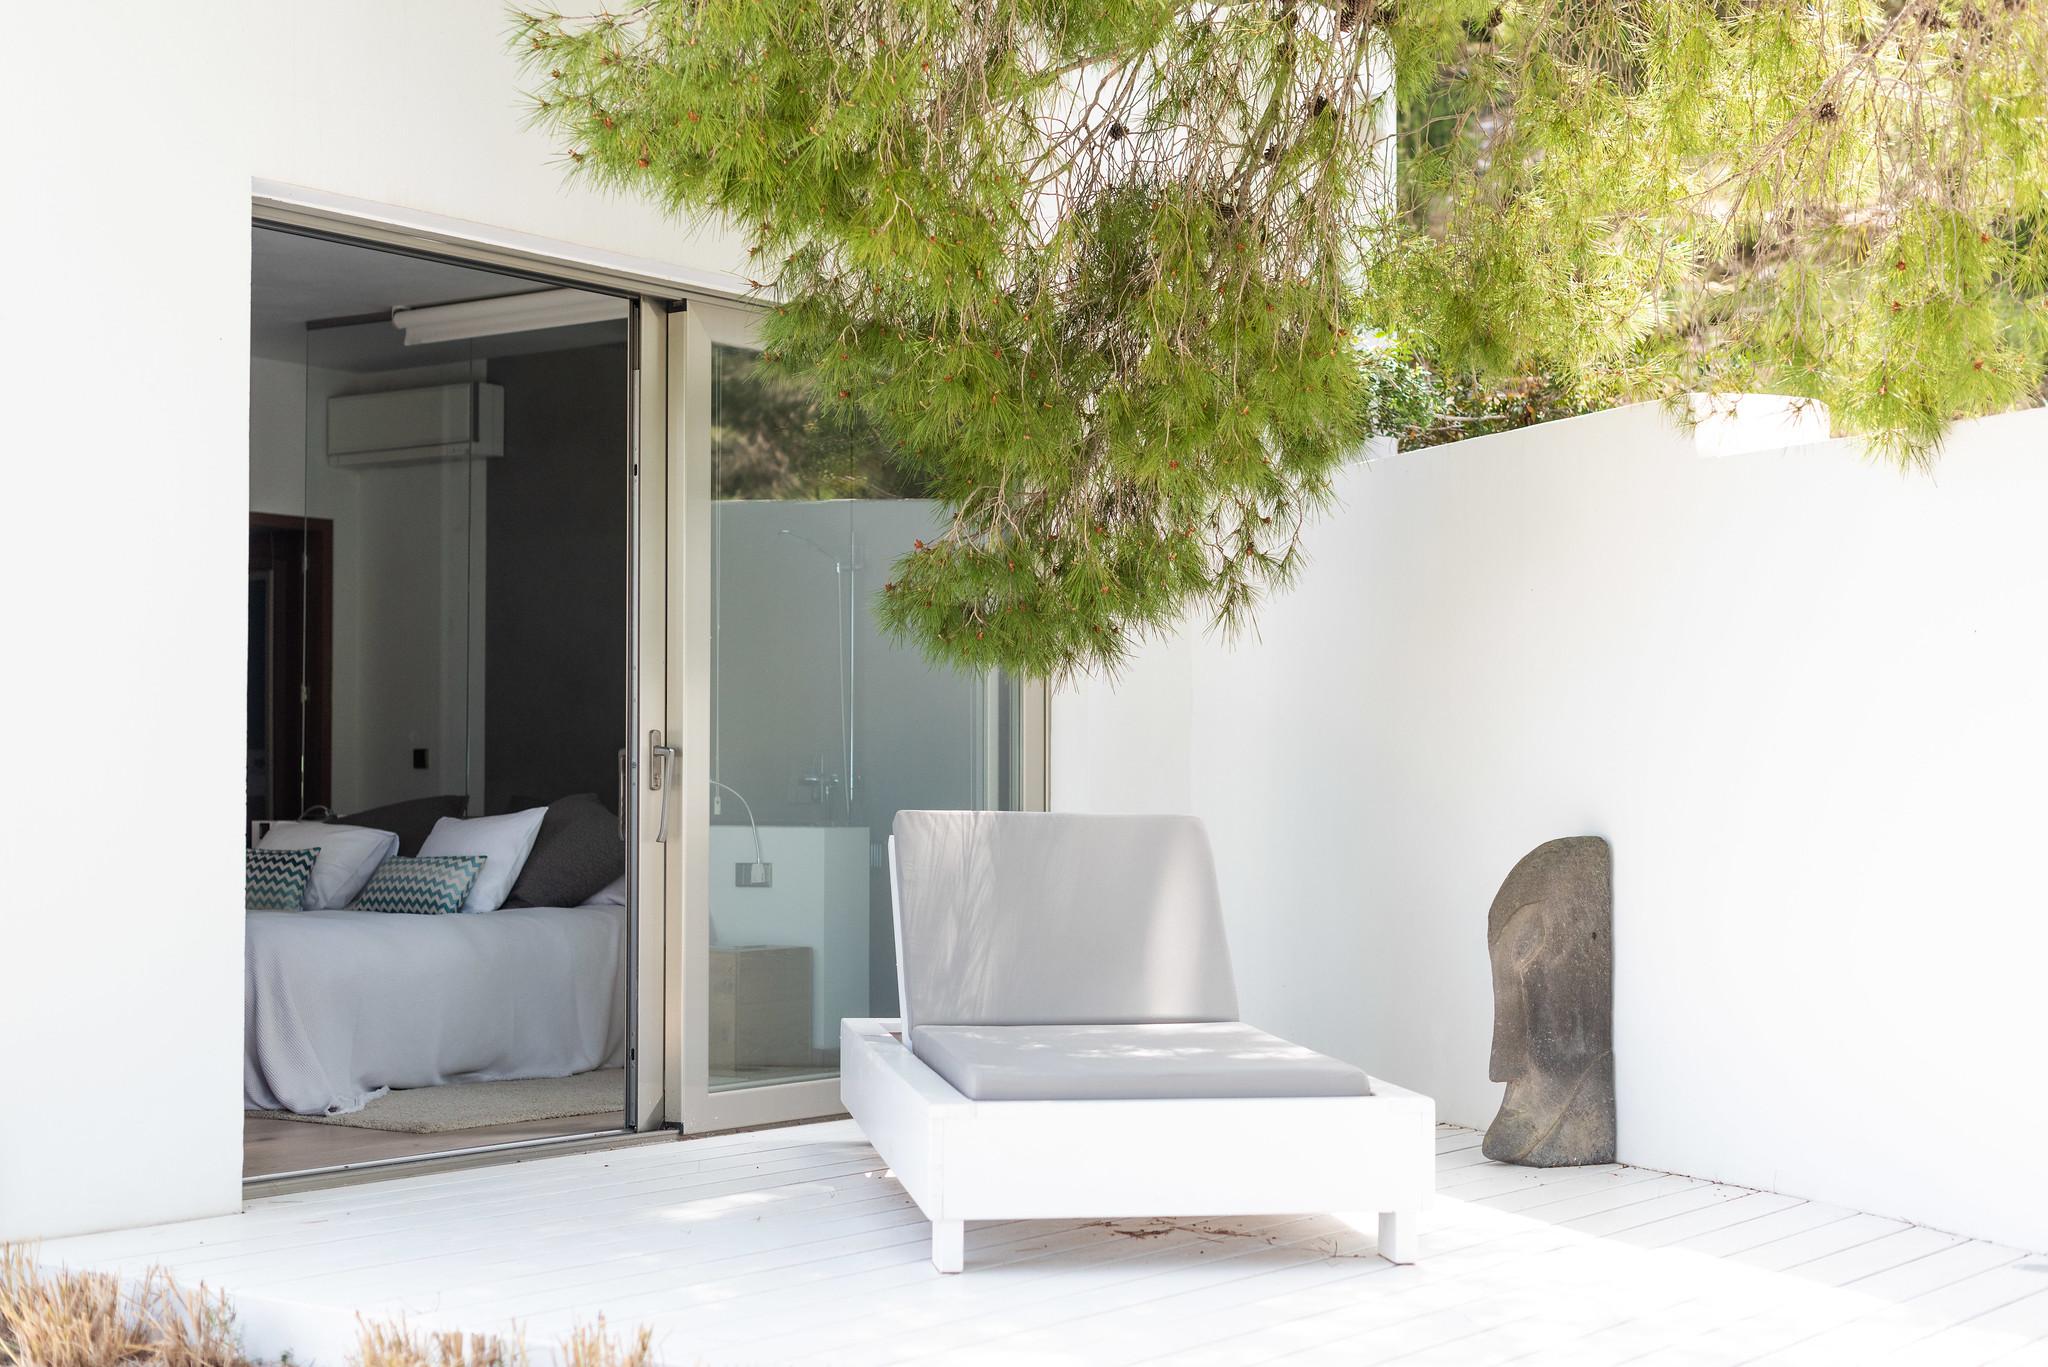 https://www.white-ibiza.com/wp-content/uploads/2020/05/white-ibiza-villas-can-dela-shaded-chill.jpg